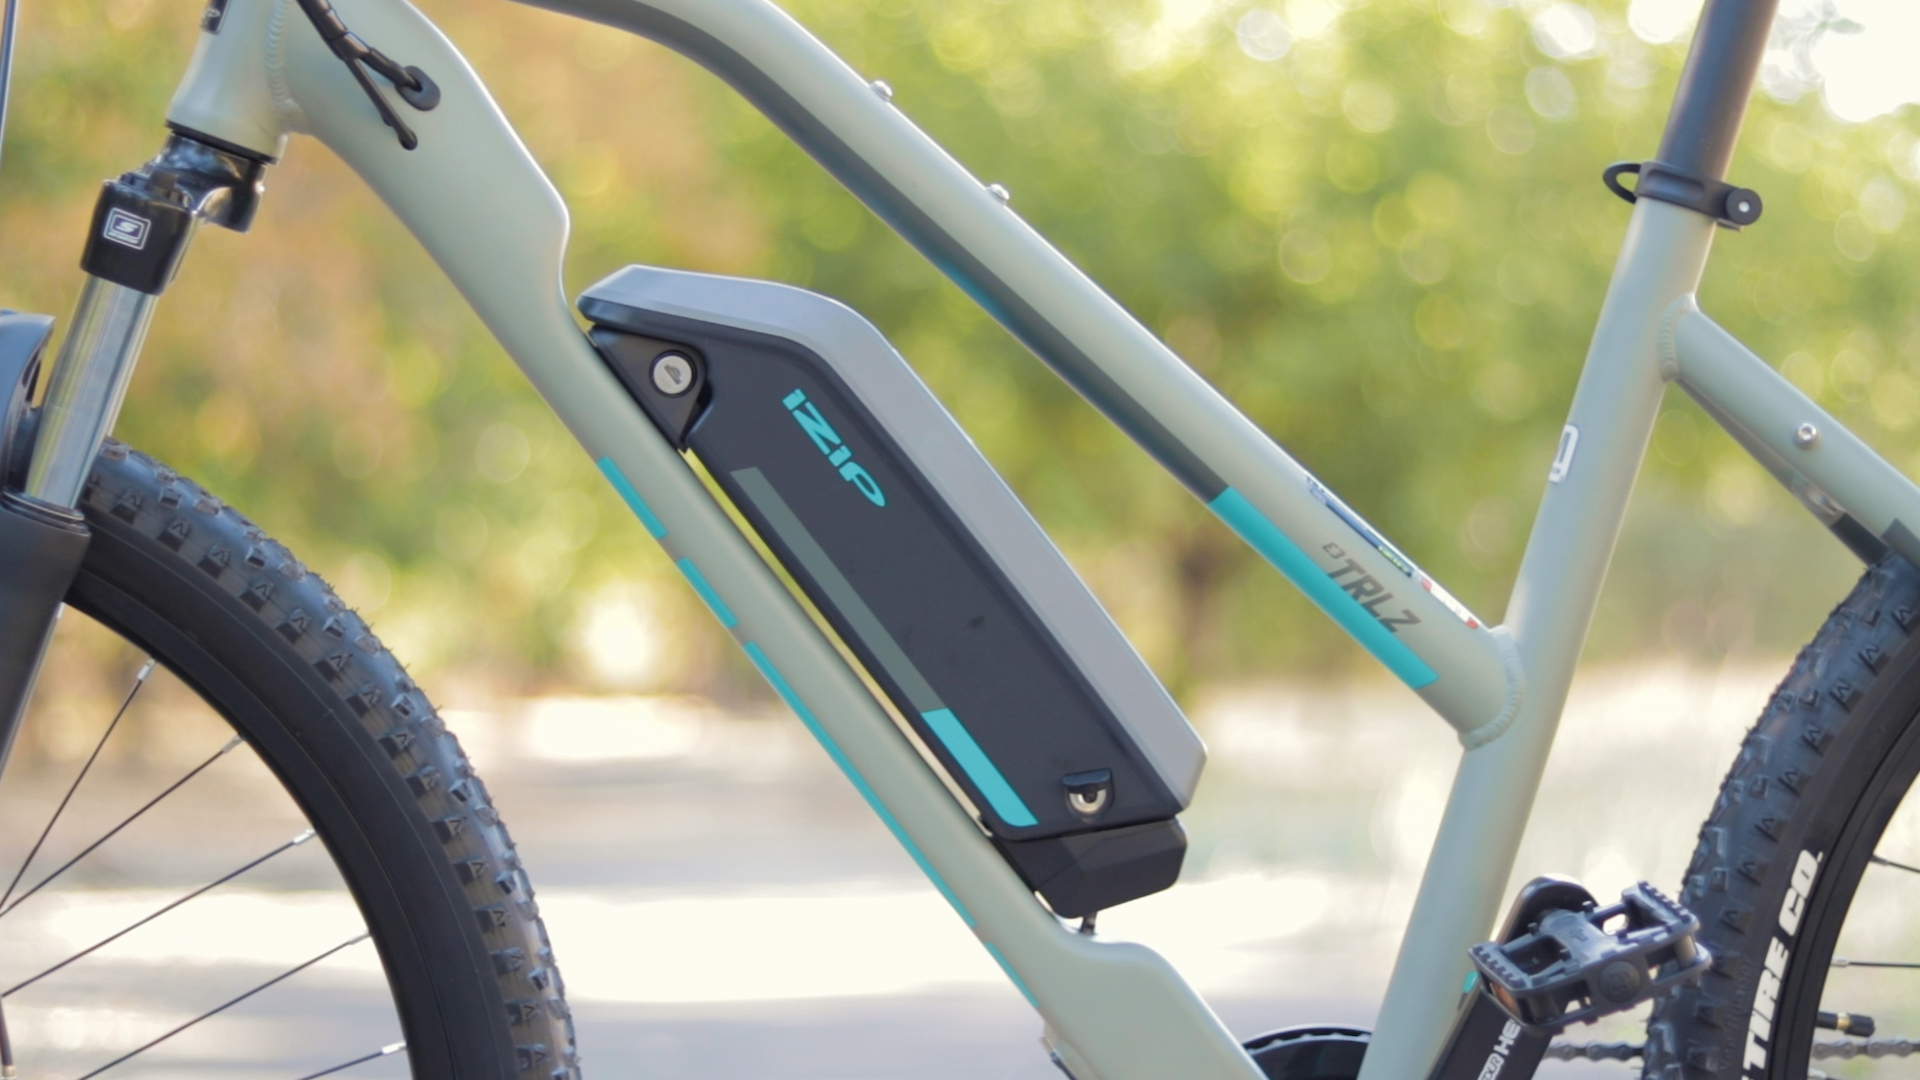 electrified-reviews-izip-trlz-electric-bike-review-battery-2.jpg